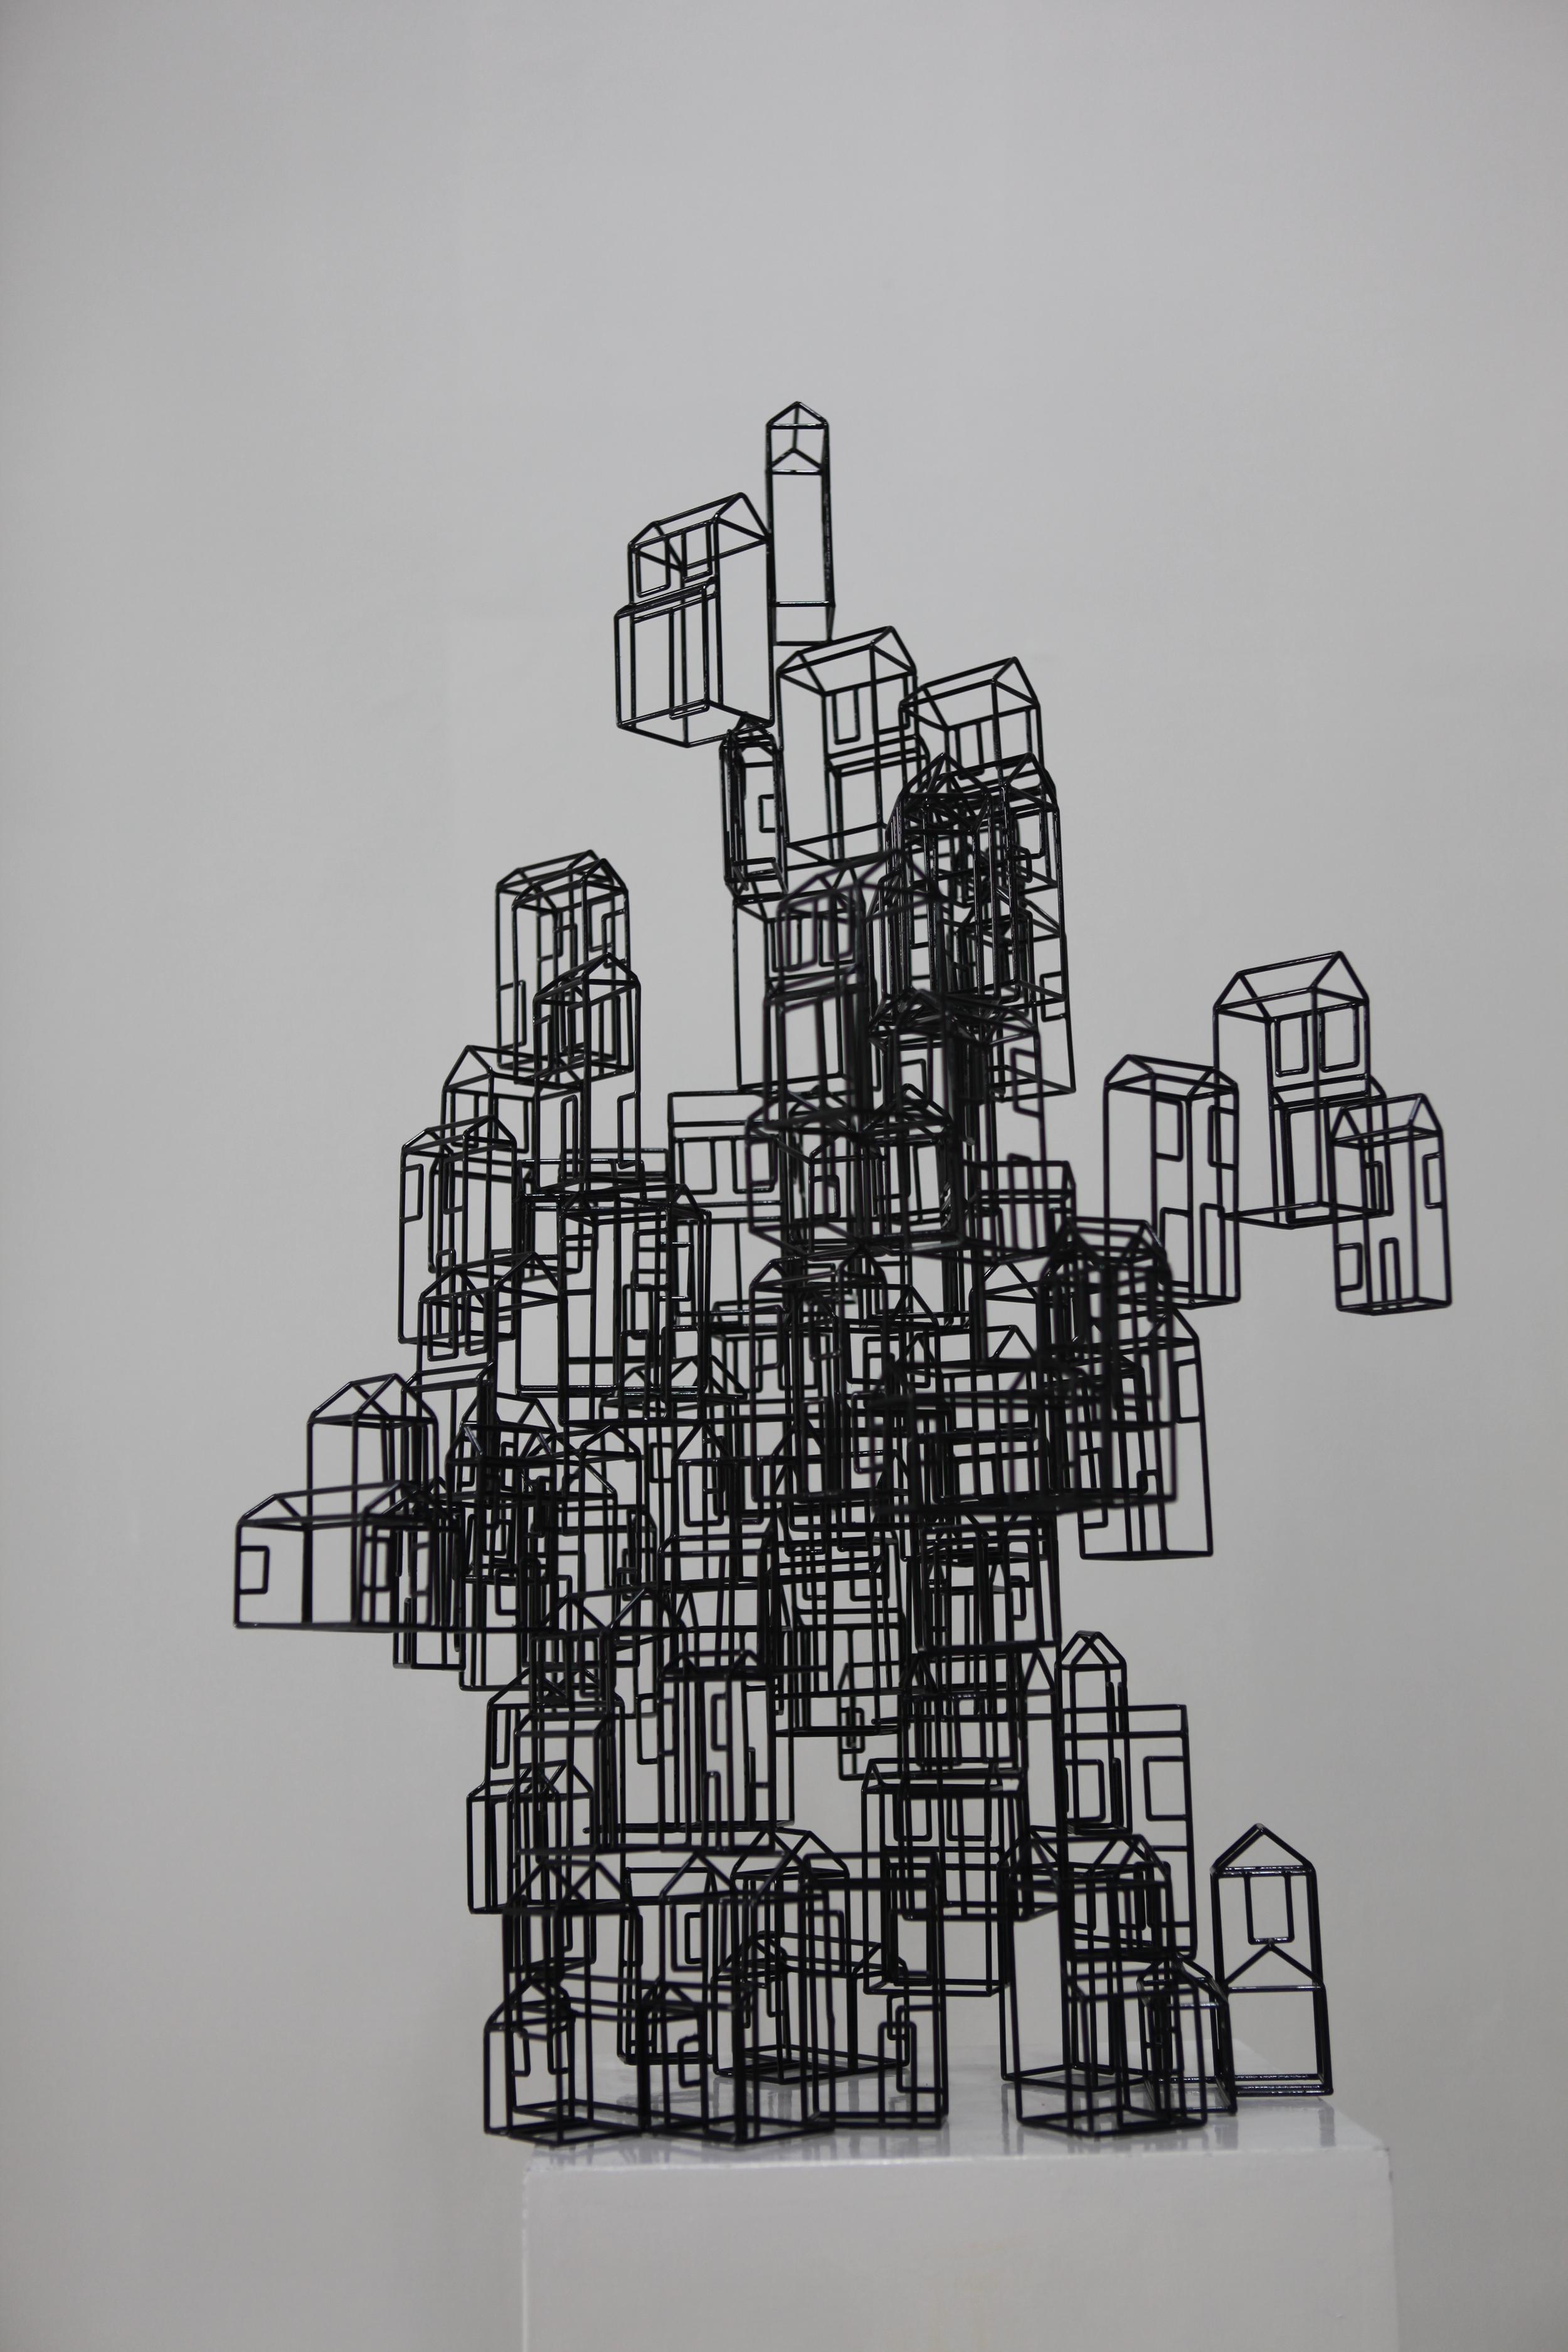 Zheng Lu 郑路, Yuntu - Suzhou 云图 - 苏州, 2013, Stainless Steel and lacquer 不锈钢与漆, 60 x 70 x 68 cm